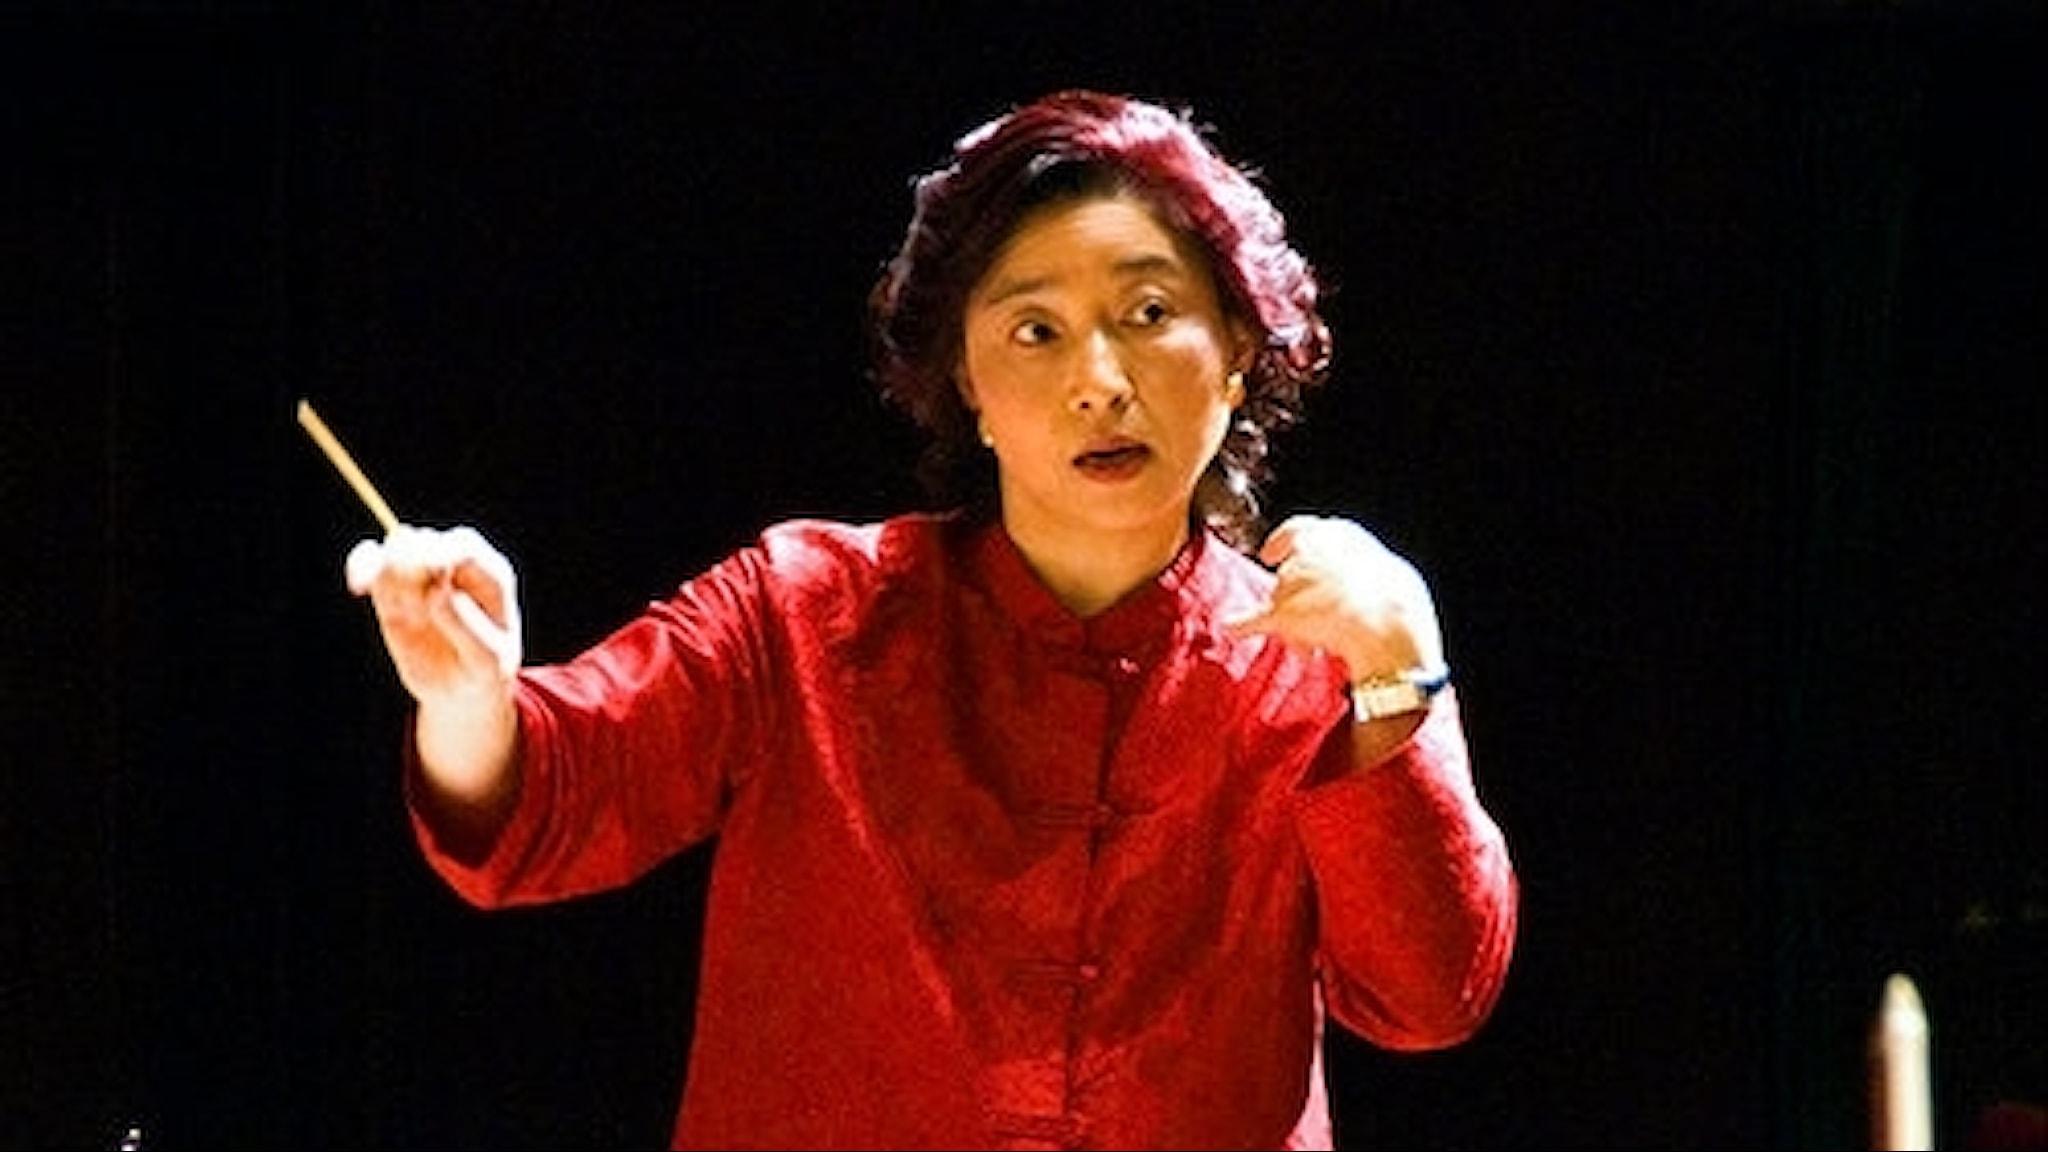 Taiwanfödda Apo-Hsu var chefdirigent i Women's Philharmonic 1997 - 2003. Foto: Alton Thompson